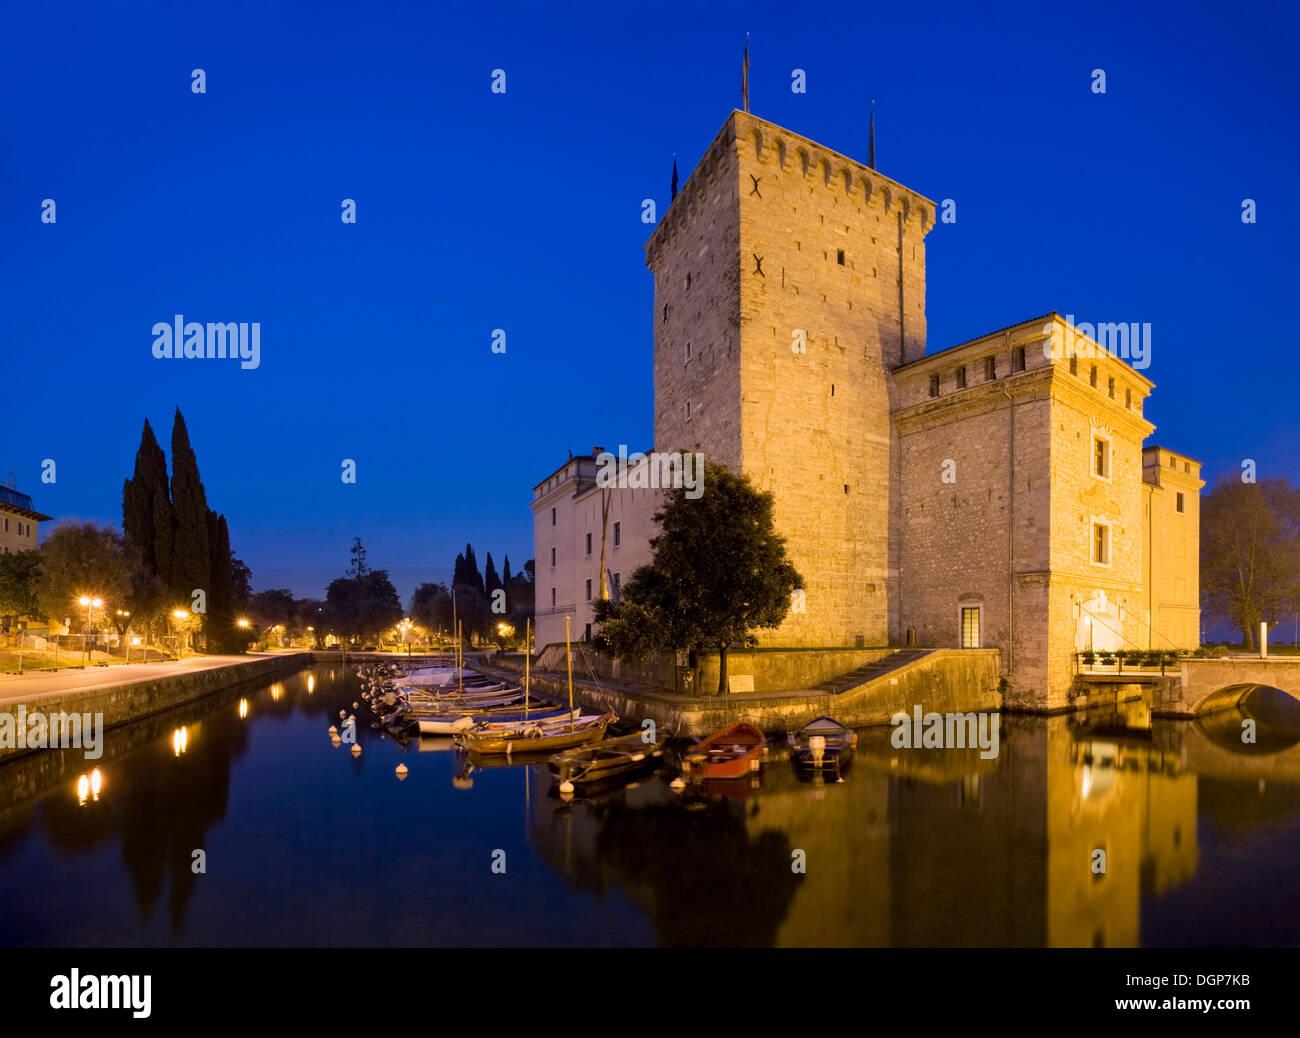 Medieval Rocca fortress with moat in Riva del Garda, Lake Garda, Trentino, Alto Adige, Italy, Europe - Stock Image